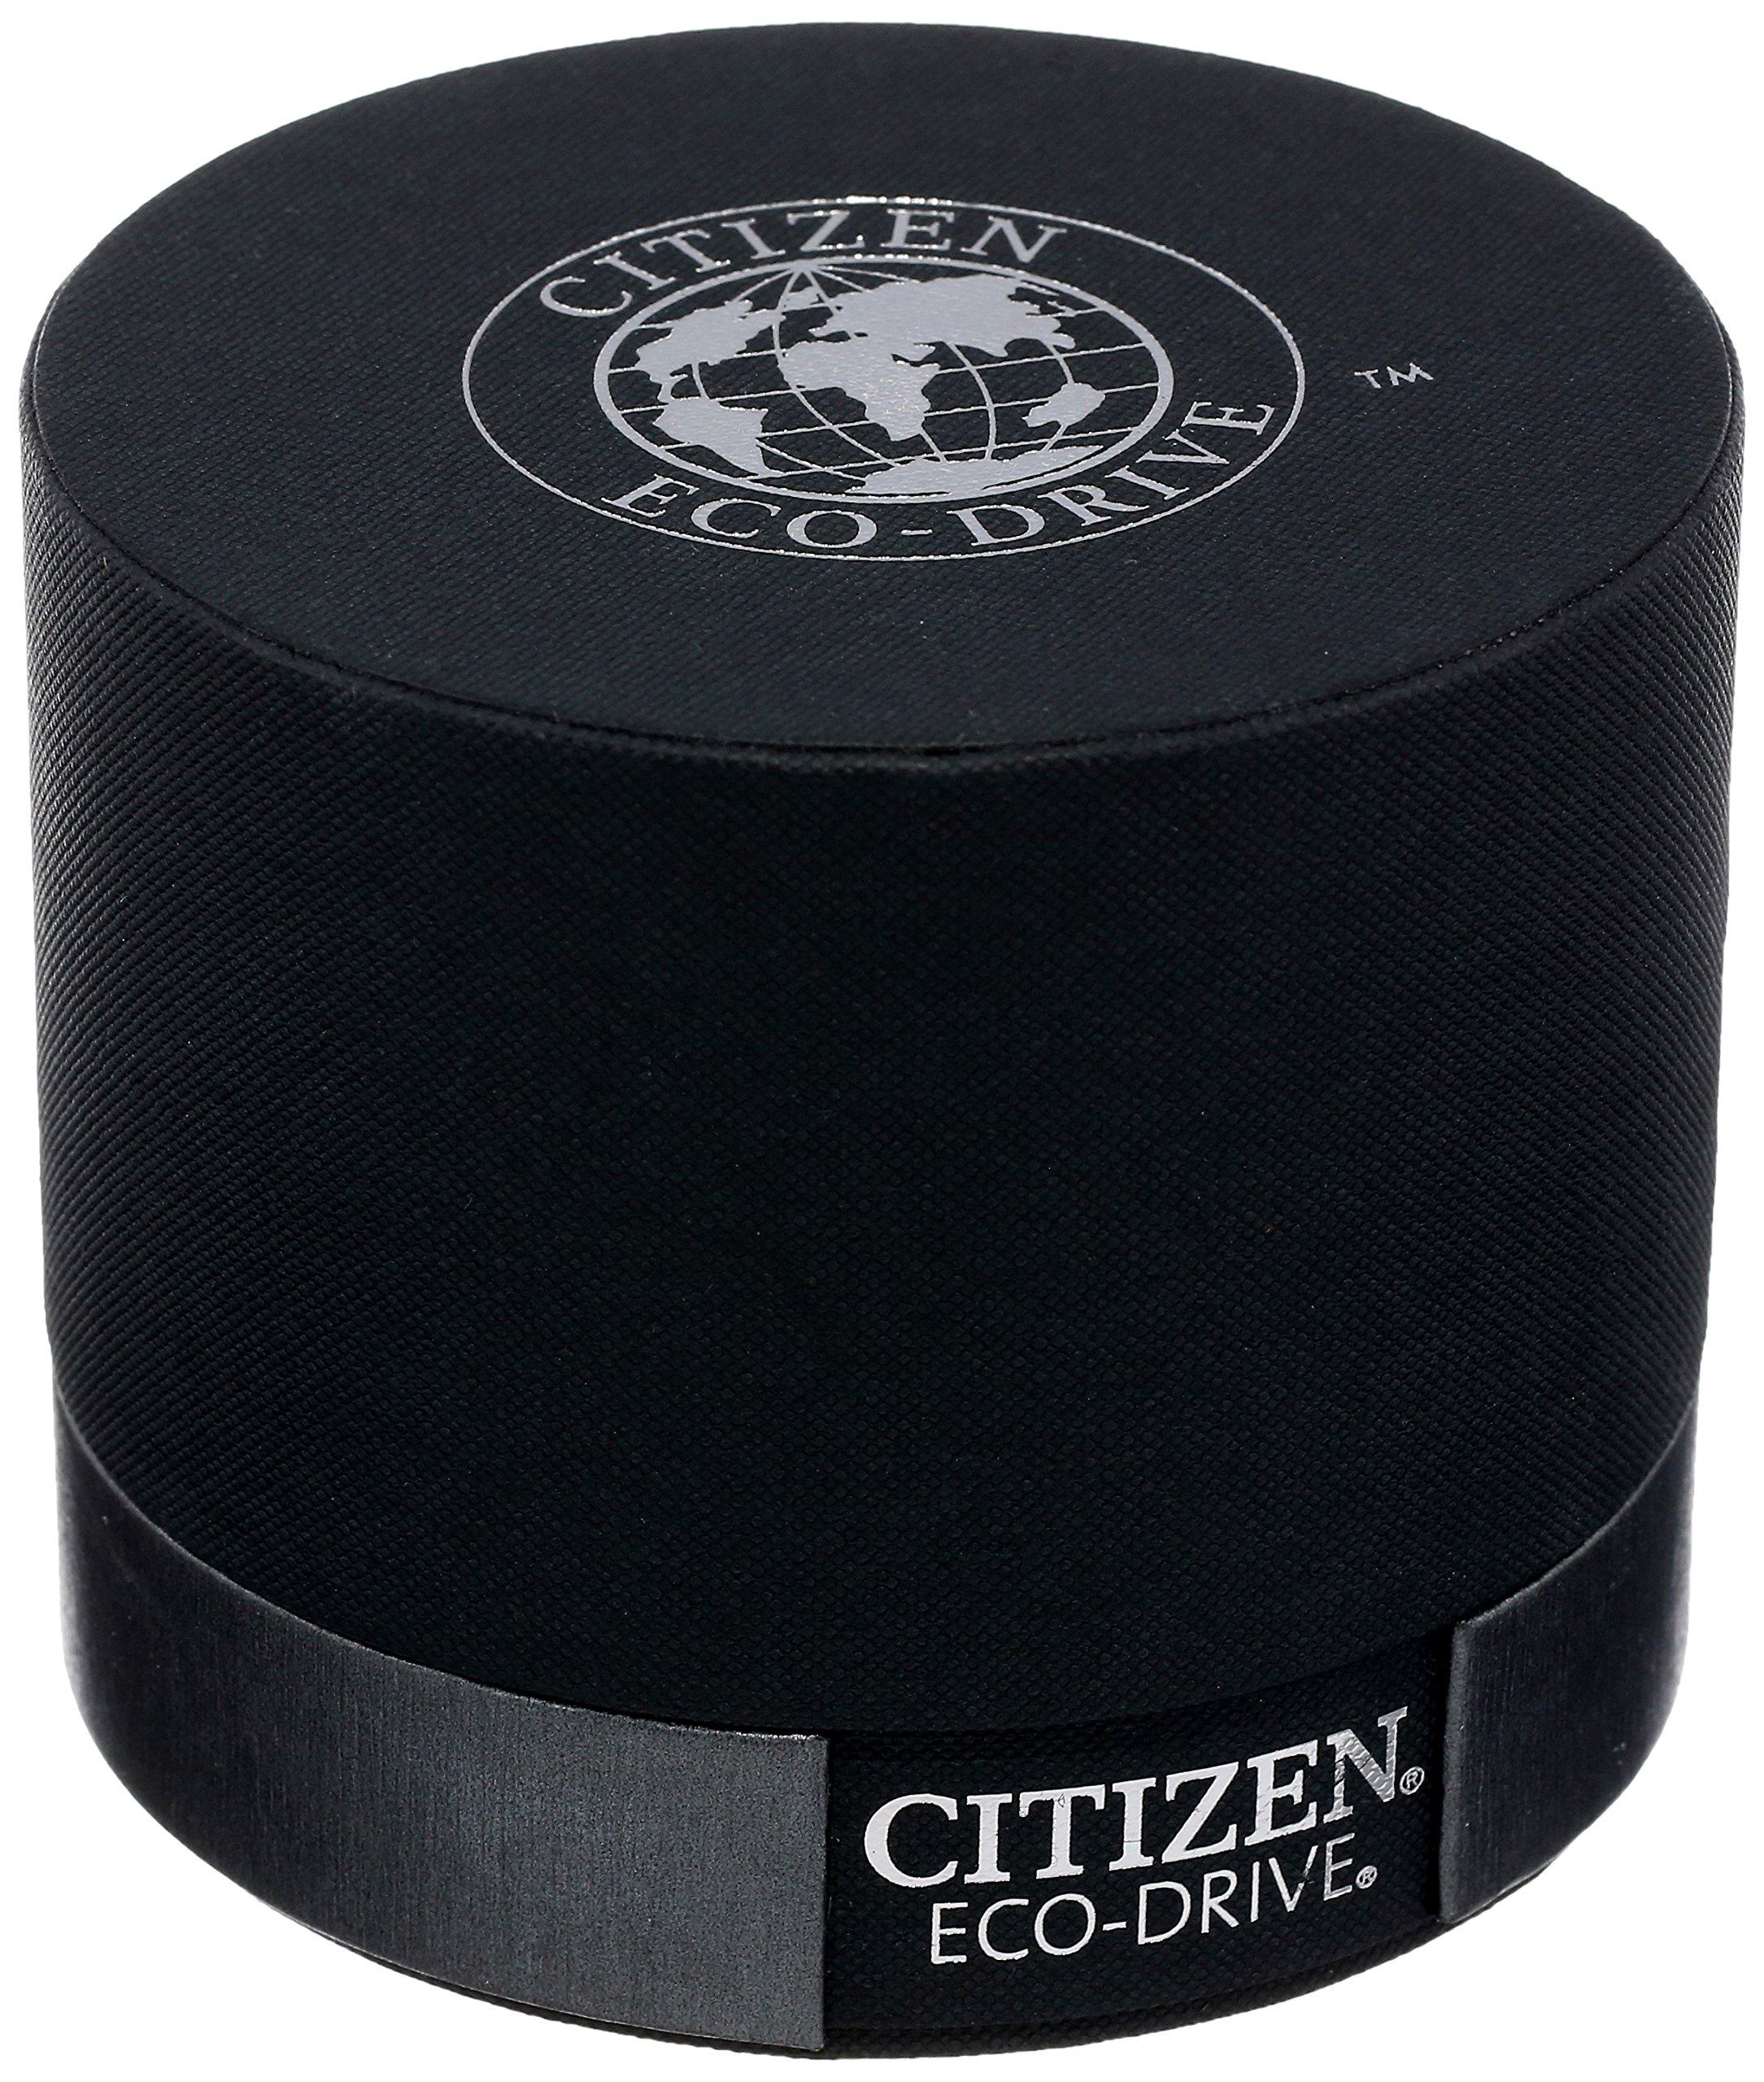 Citizen Men's Eco-Drive Stainless Steel Watch, AU1040-08E by Citizen (Image #4)